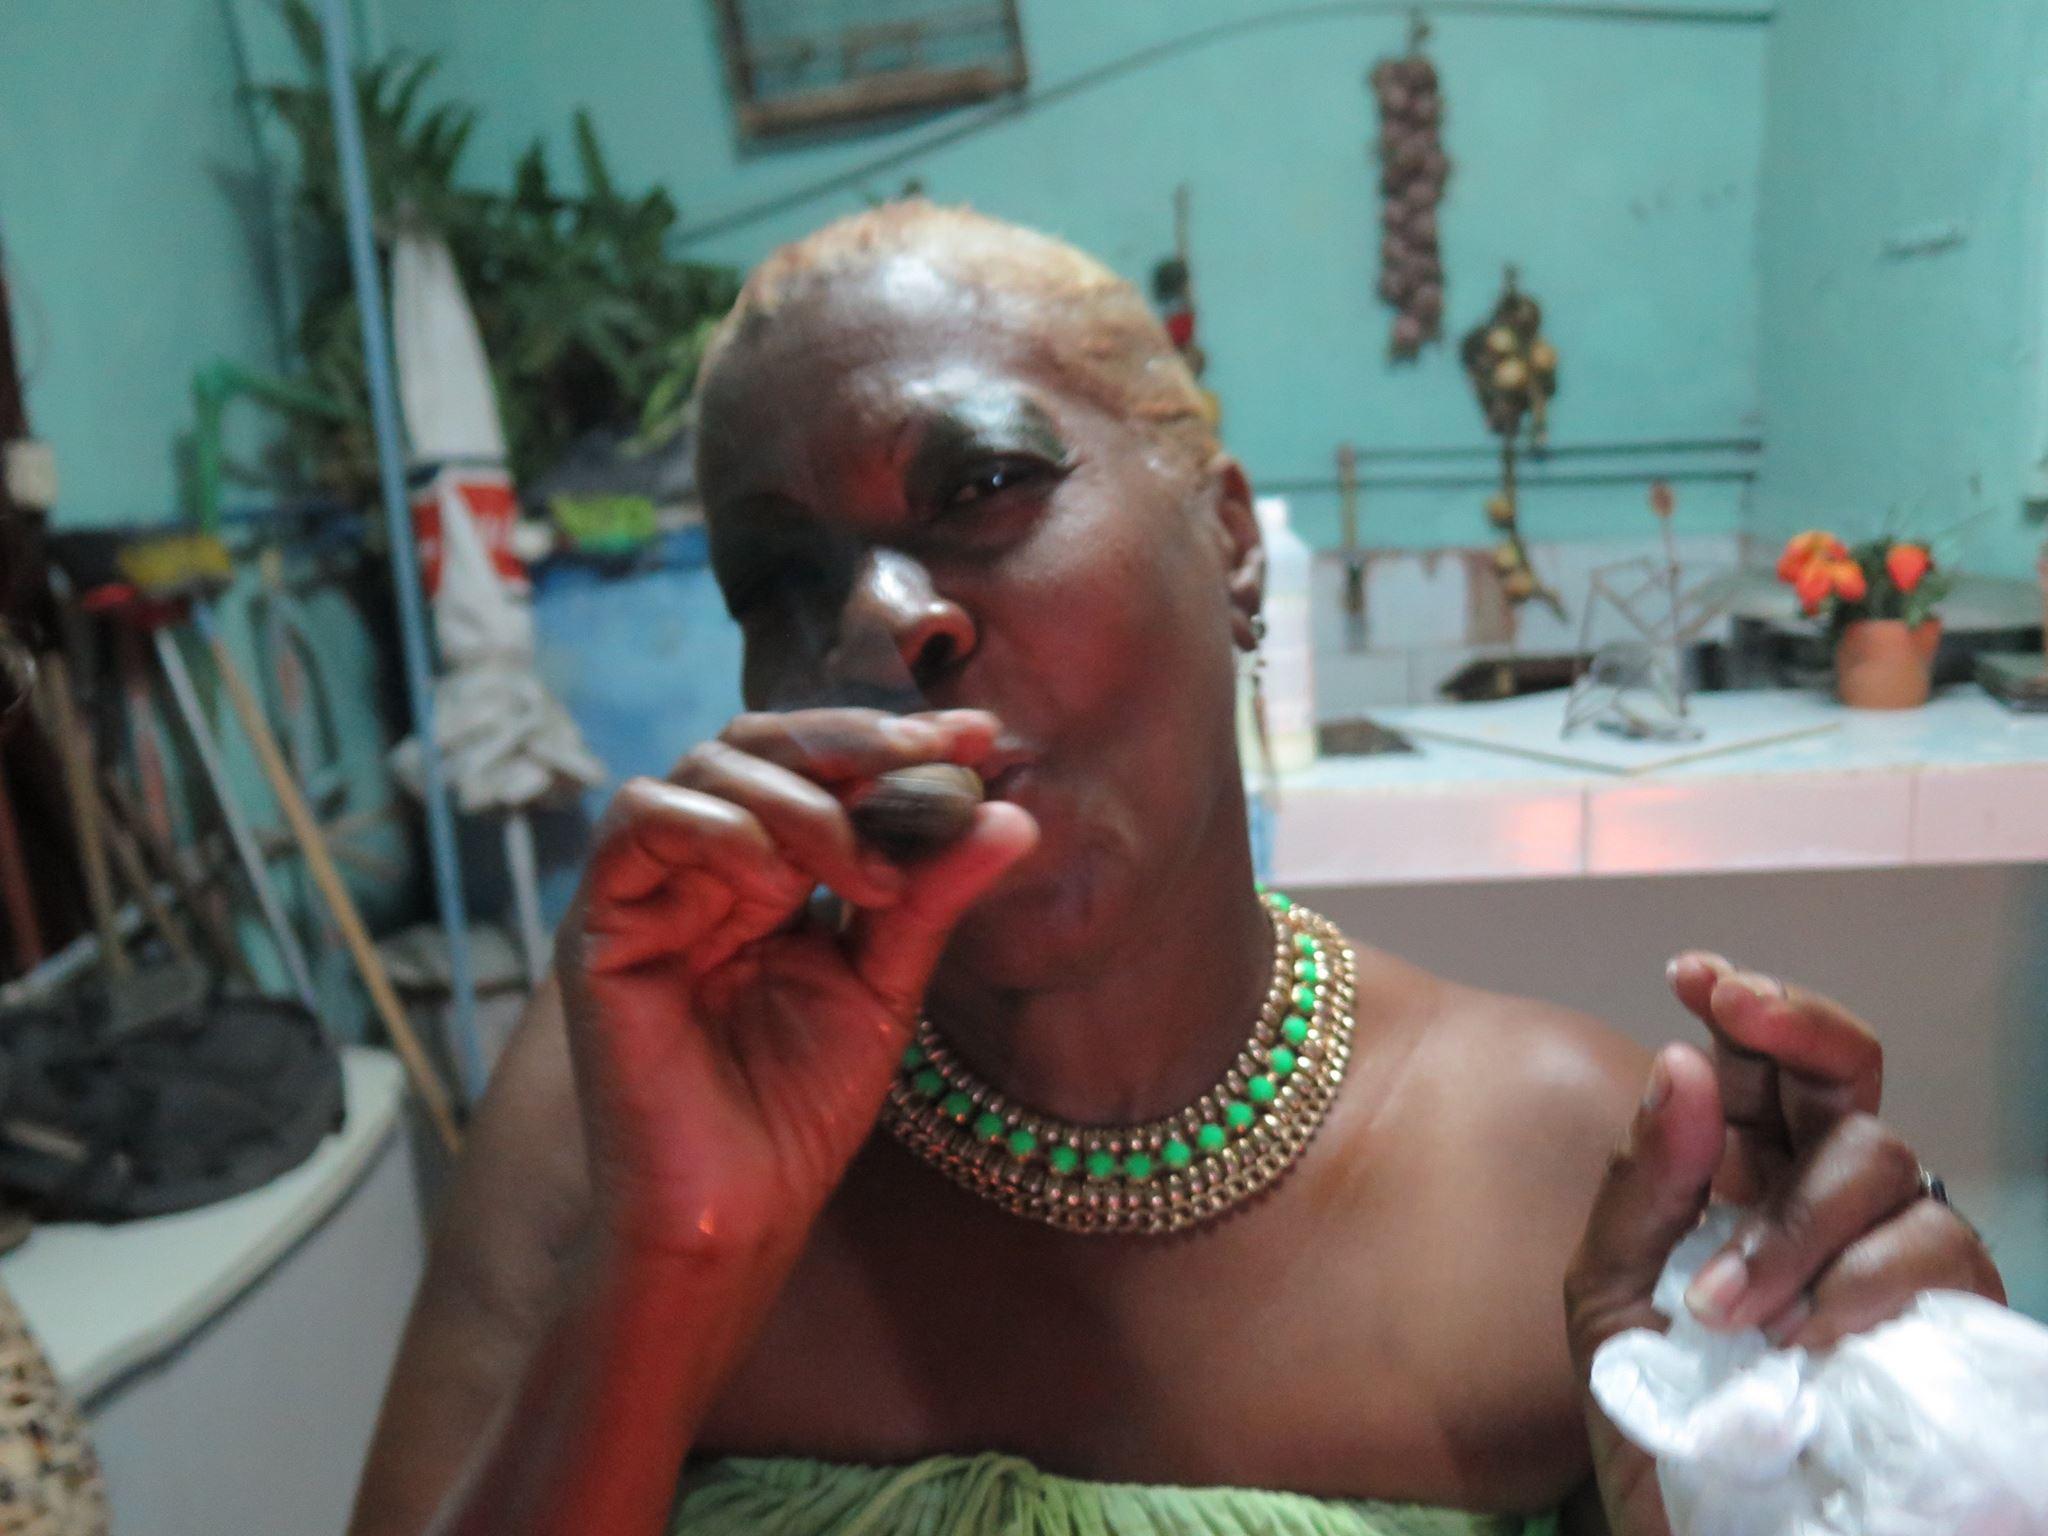 san lazaro, saint lazaro, celebration, worship, religion, santeria, catholicism, catholic, cuba, cuban, cuban streets, cuban celebration, streets of cuba, saint, patron saint of suffering, caribbean island, worshippers, woman, cigar, cuban cigar, cigars, woman smoking, woman smokes cigar. cuban woman smokes cigar